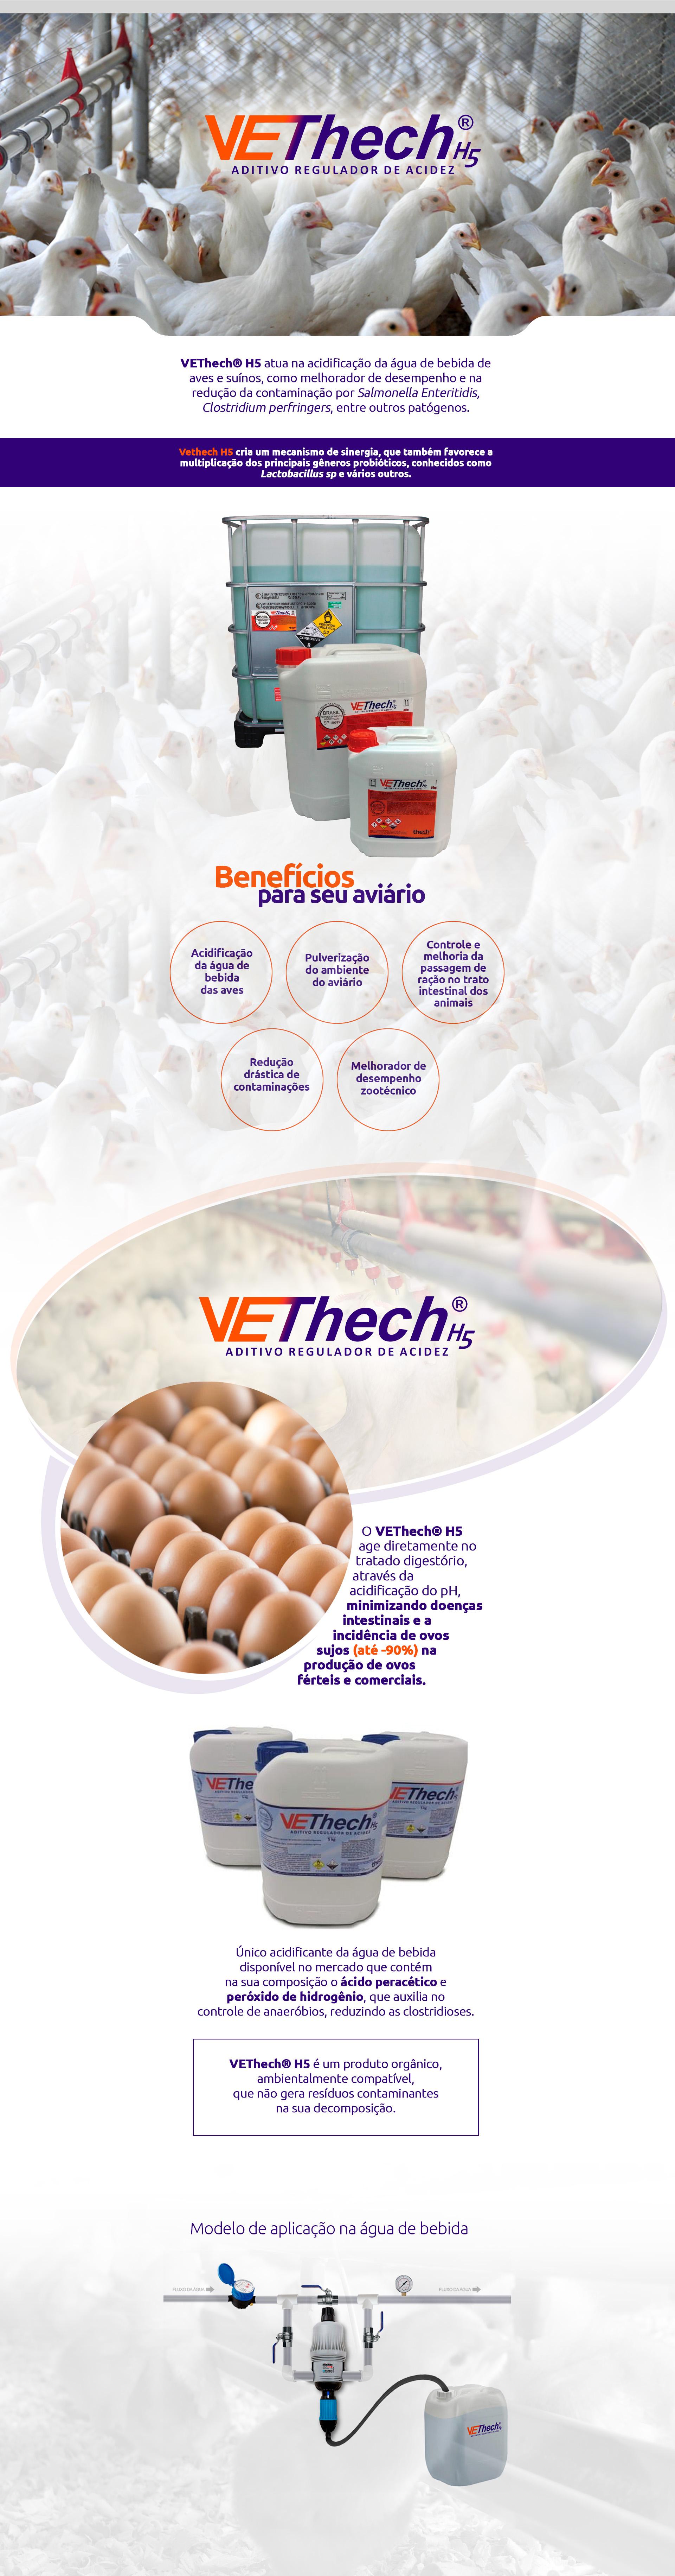 Vethech